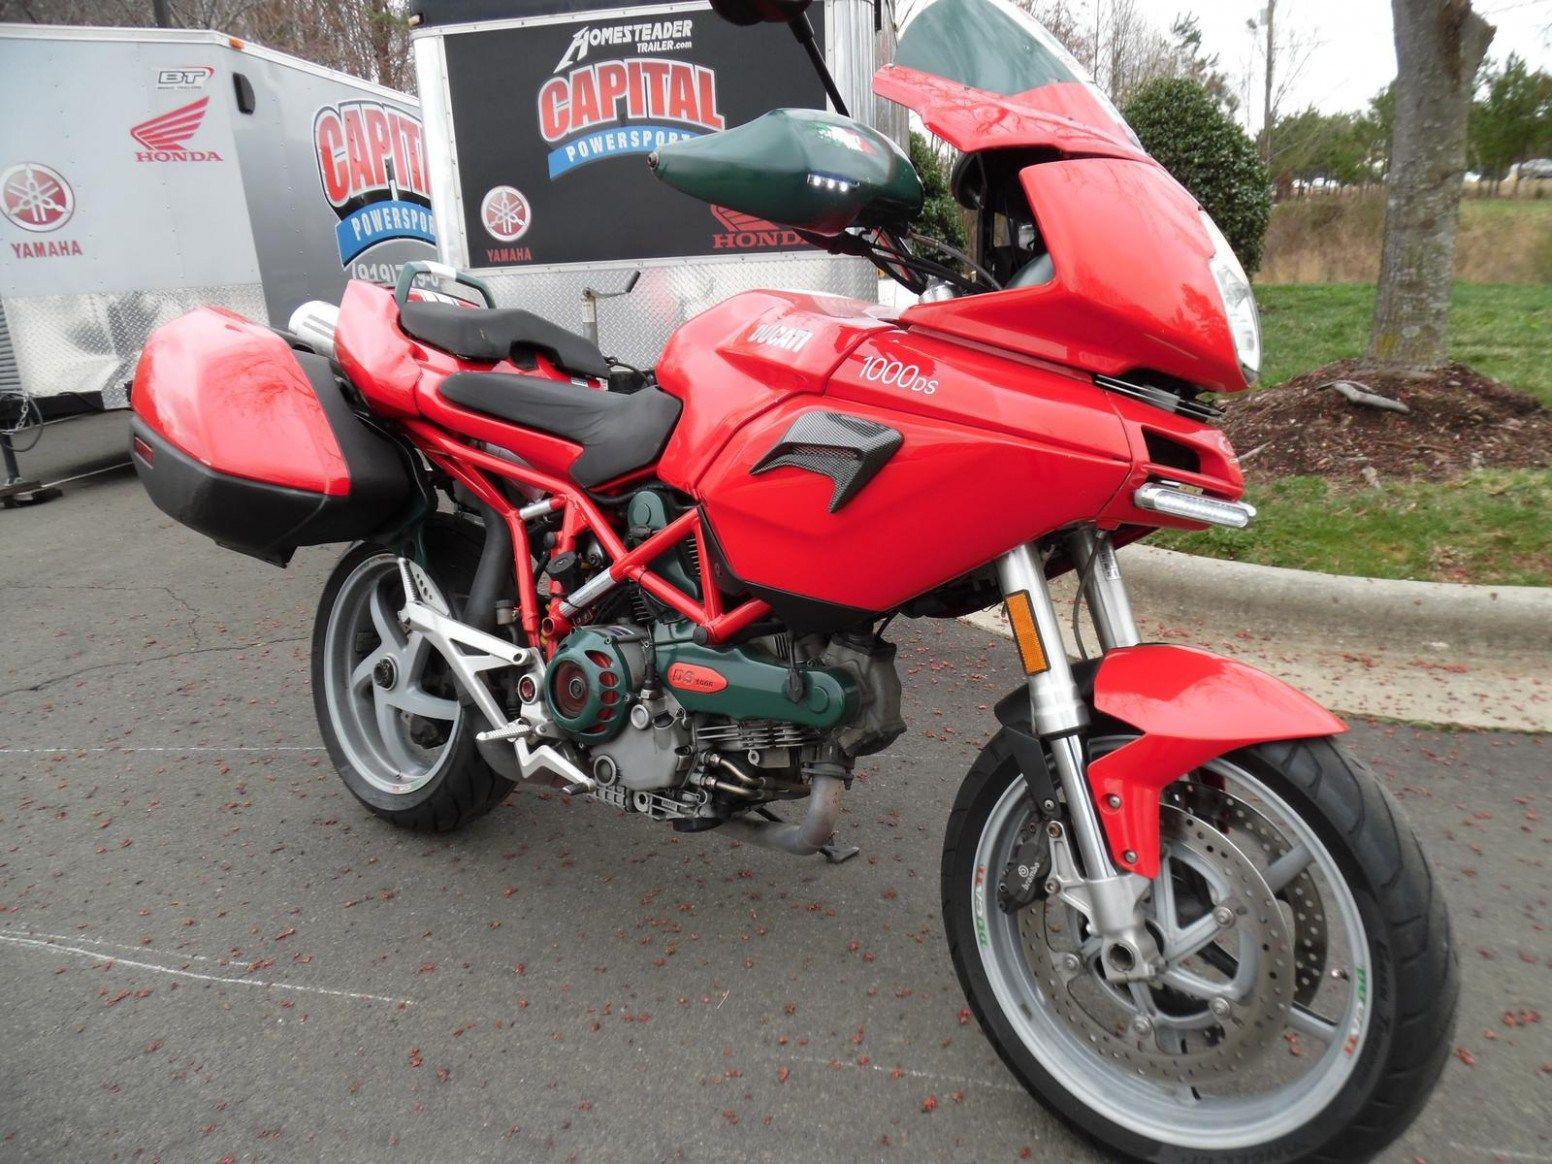 Ducati Multistrada 1000DS (2004) | Ducati multistrada